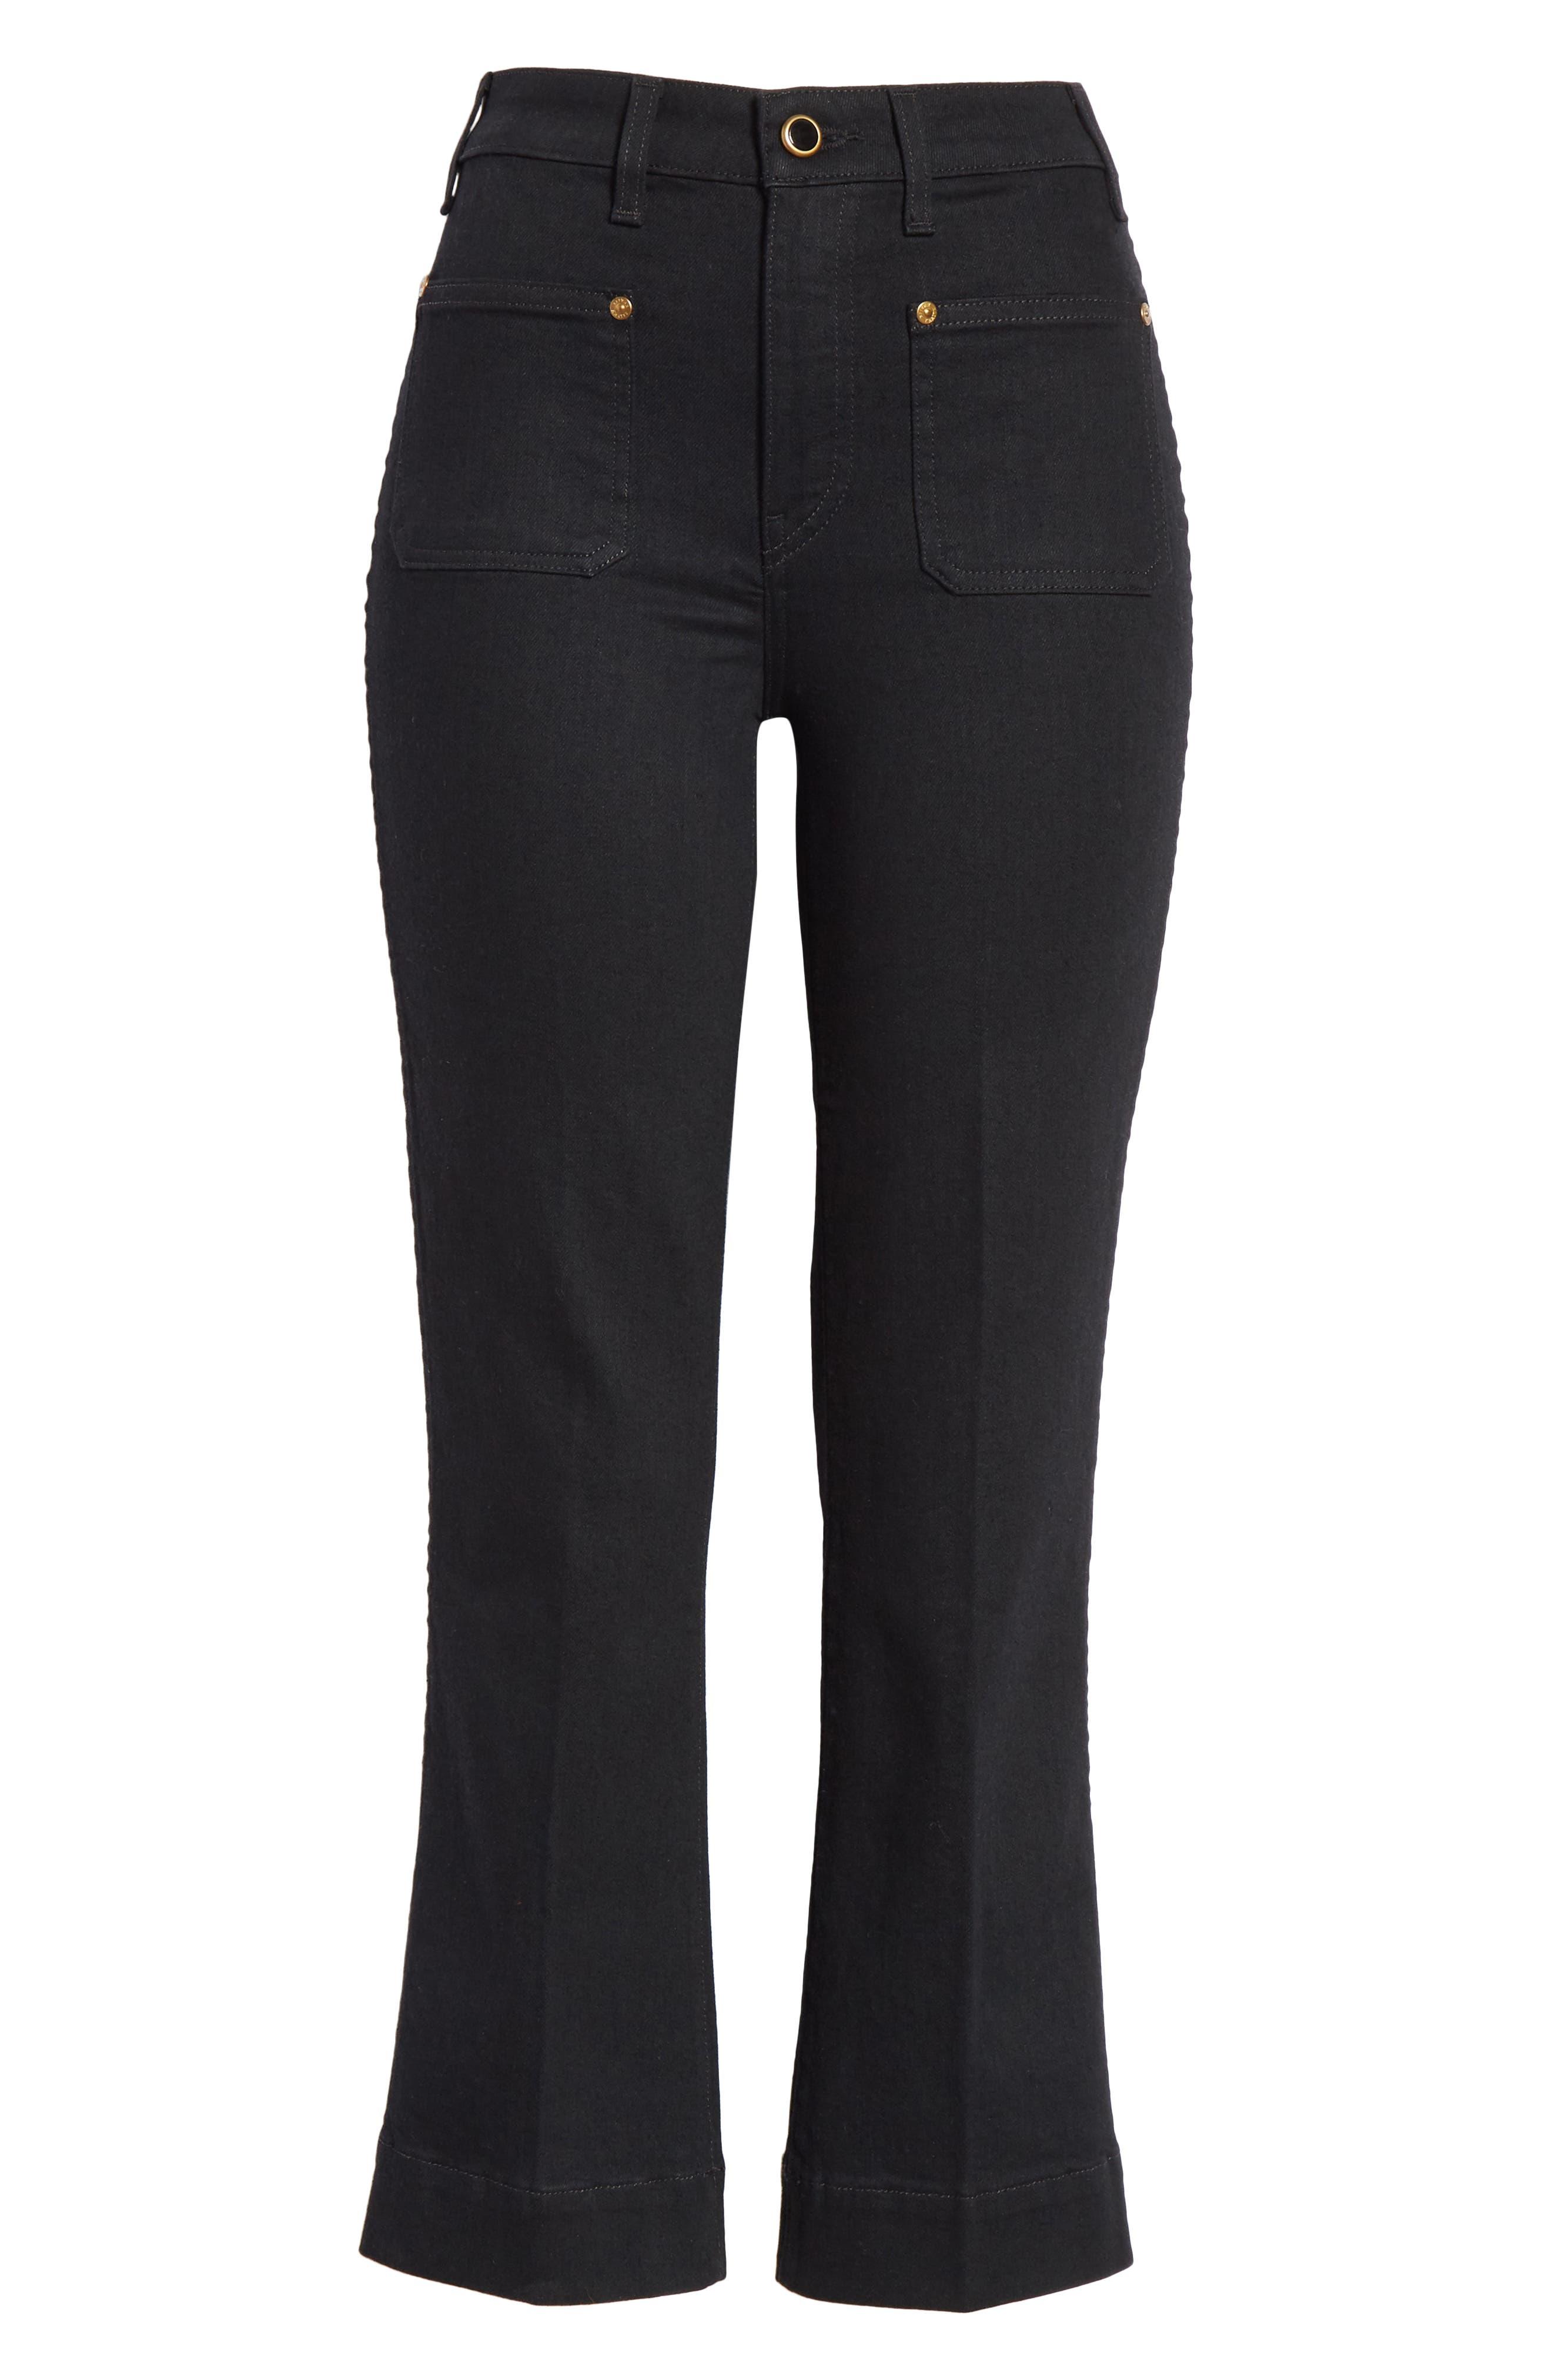 Patch Pocket Crop Flare Jeans,                             Alternate thumbnail 6, color,                             BLACK RINSE